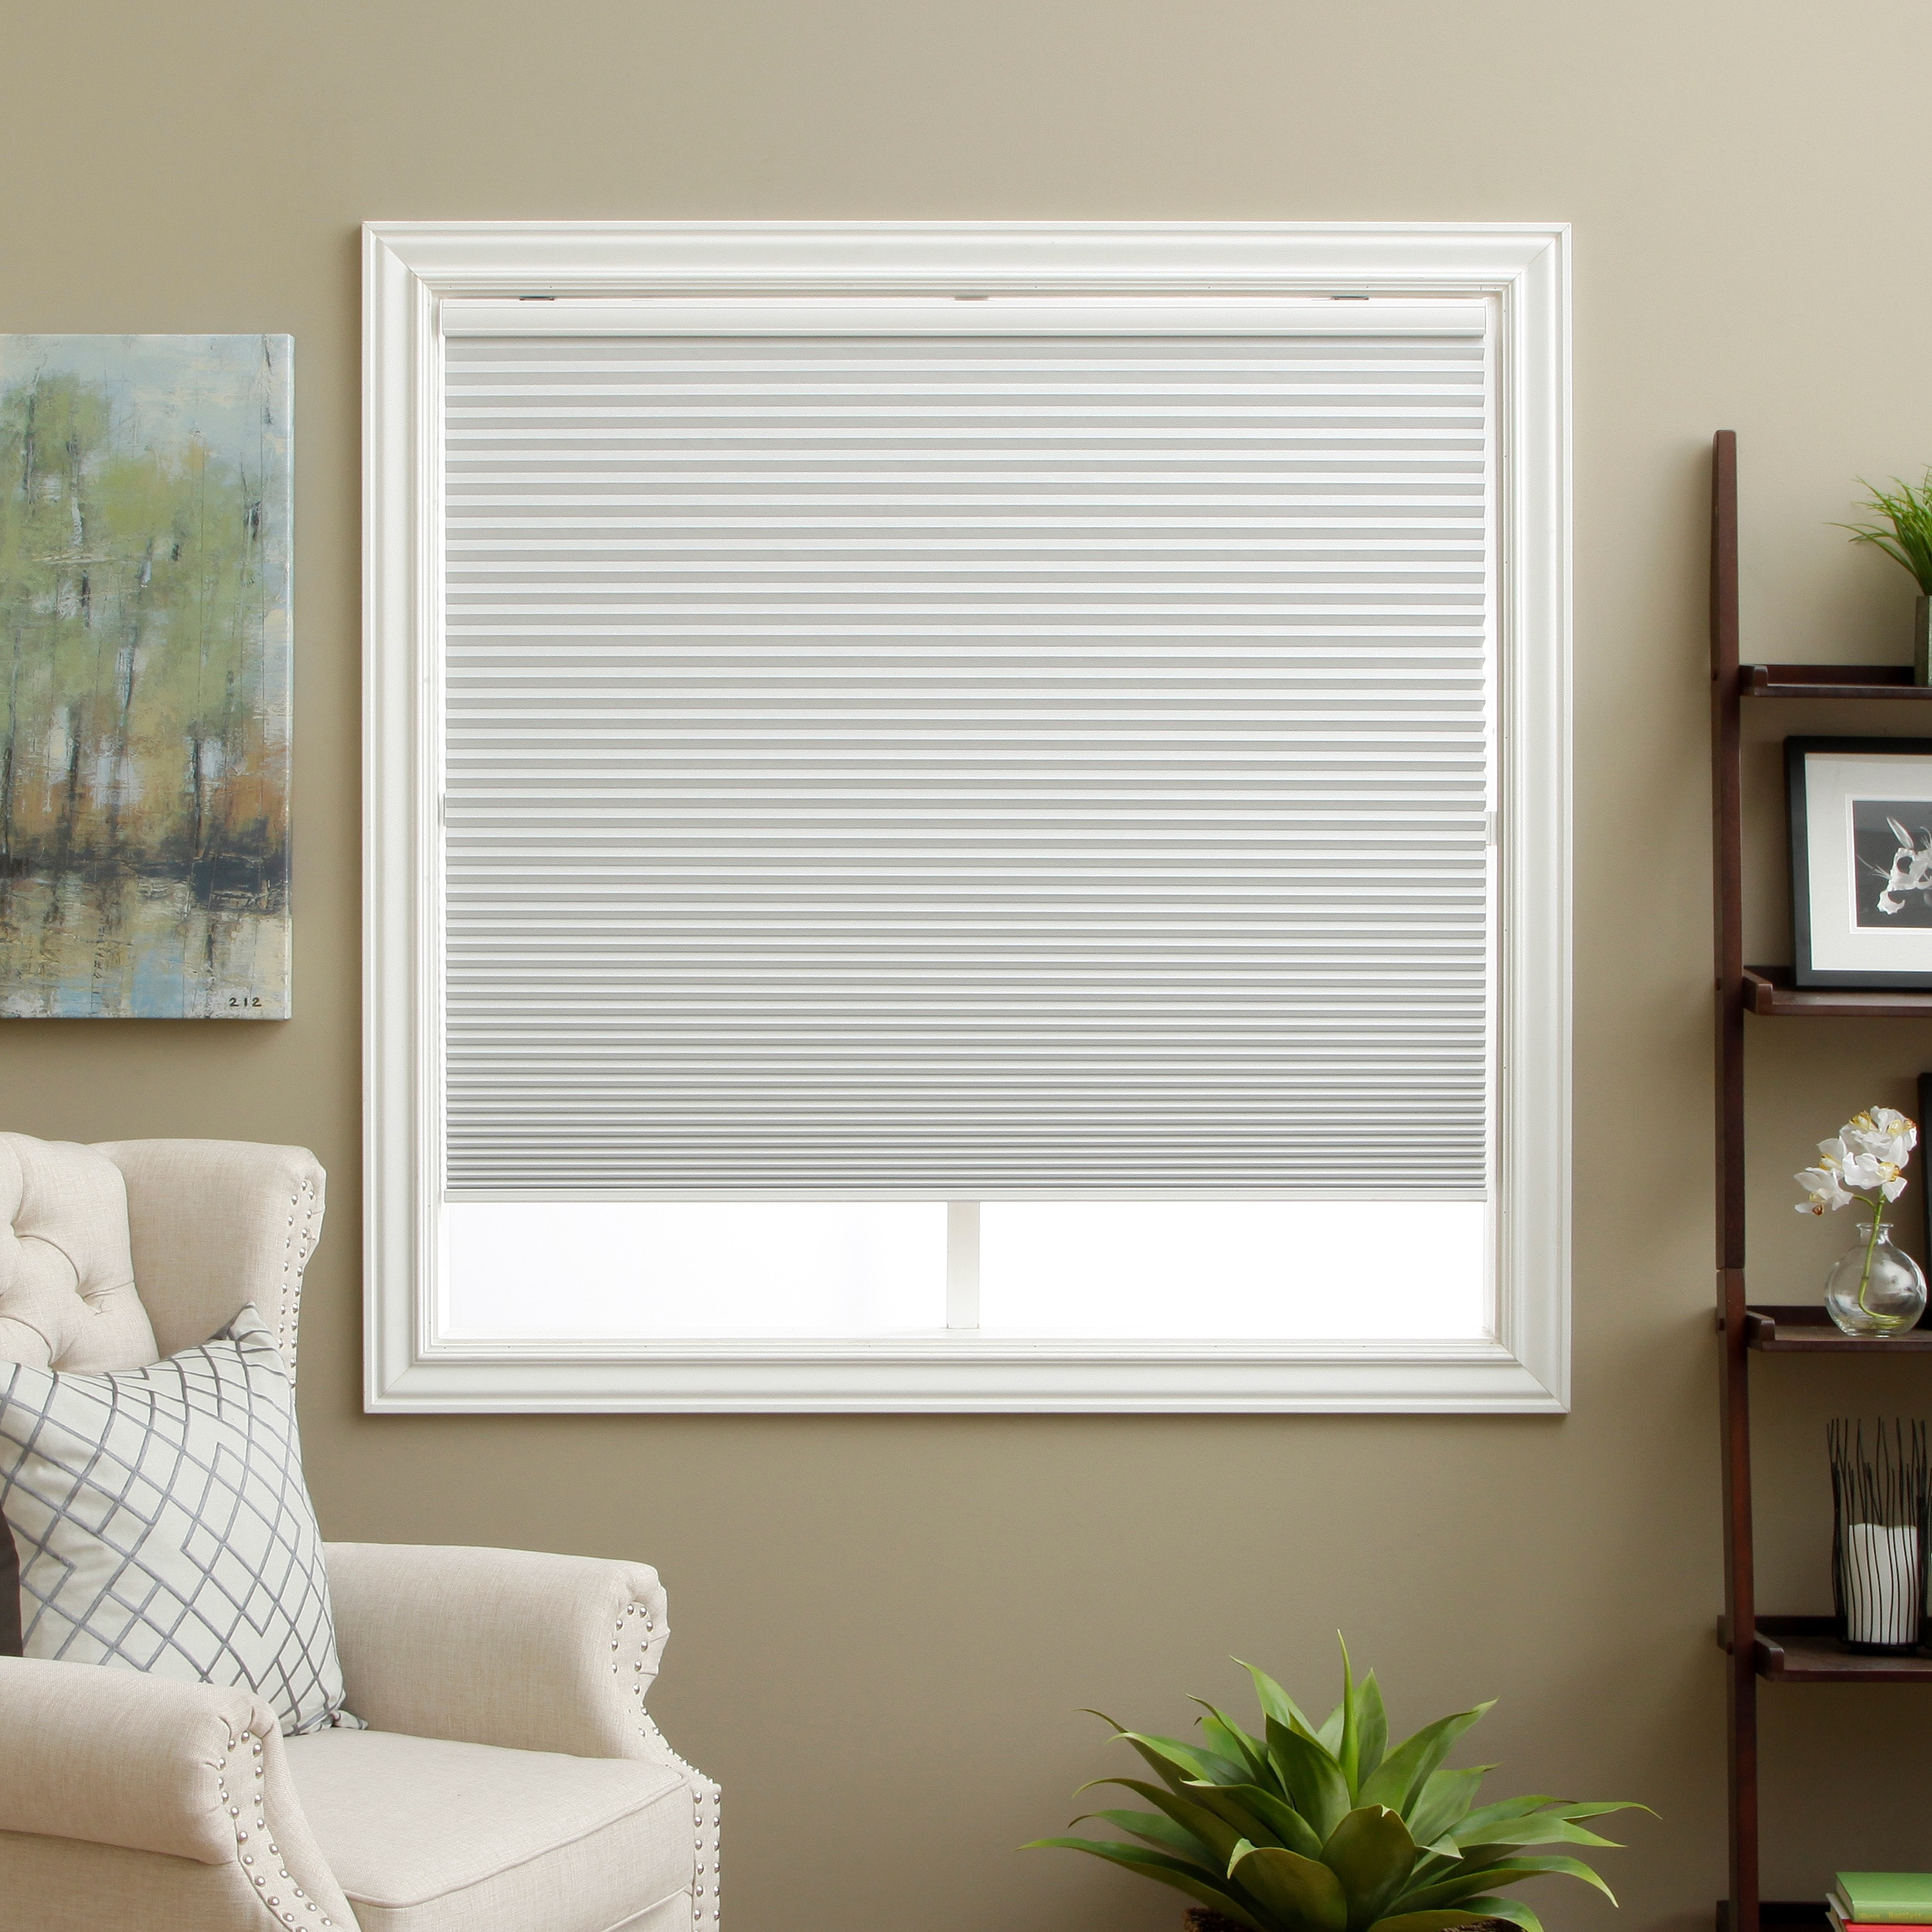 Curtains blackout honeycomb shades blackout shades blinds blinds and - Arlo Blinds Honeycomb White Cell Blackout Cordless Cellular Shades Walmart Com